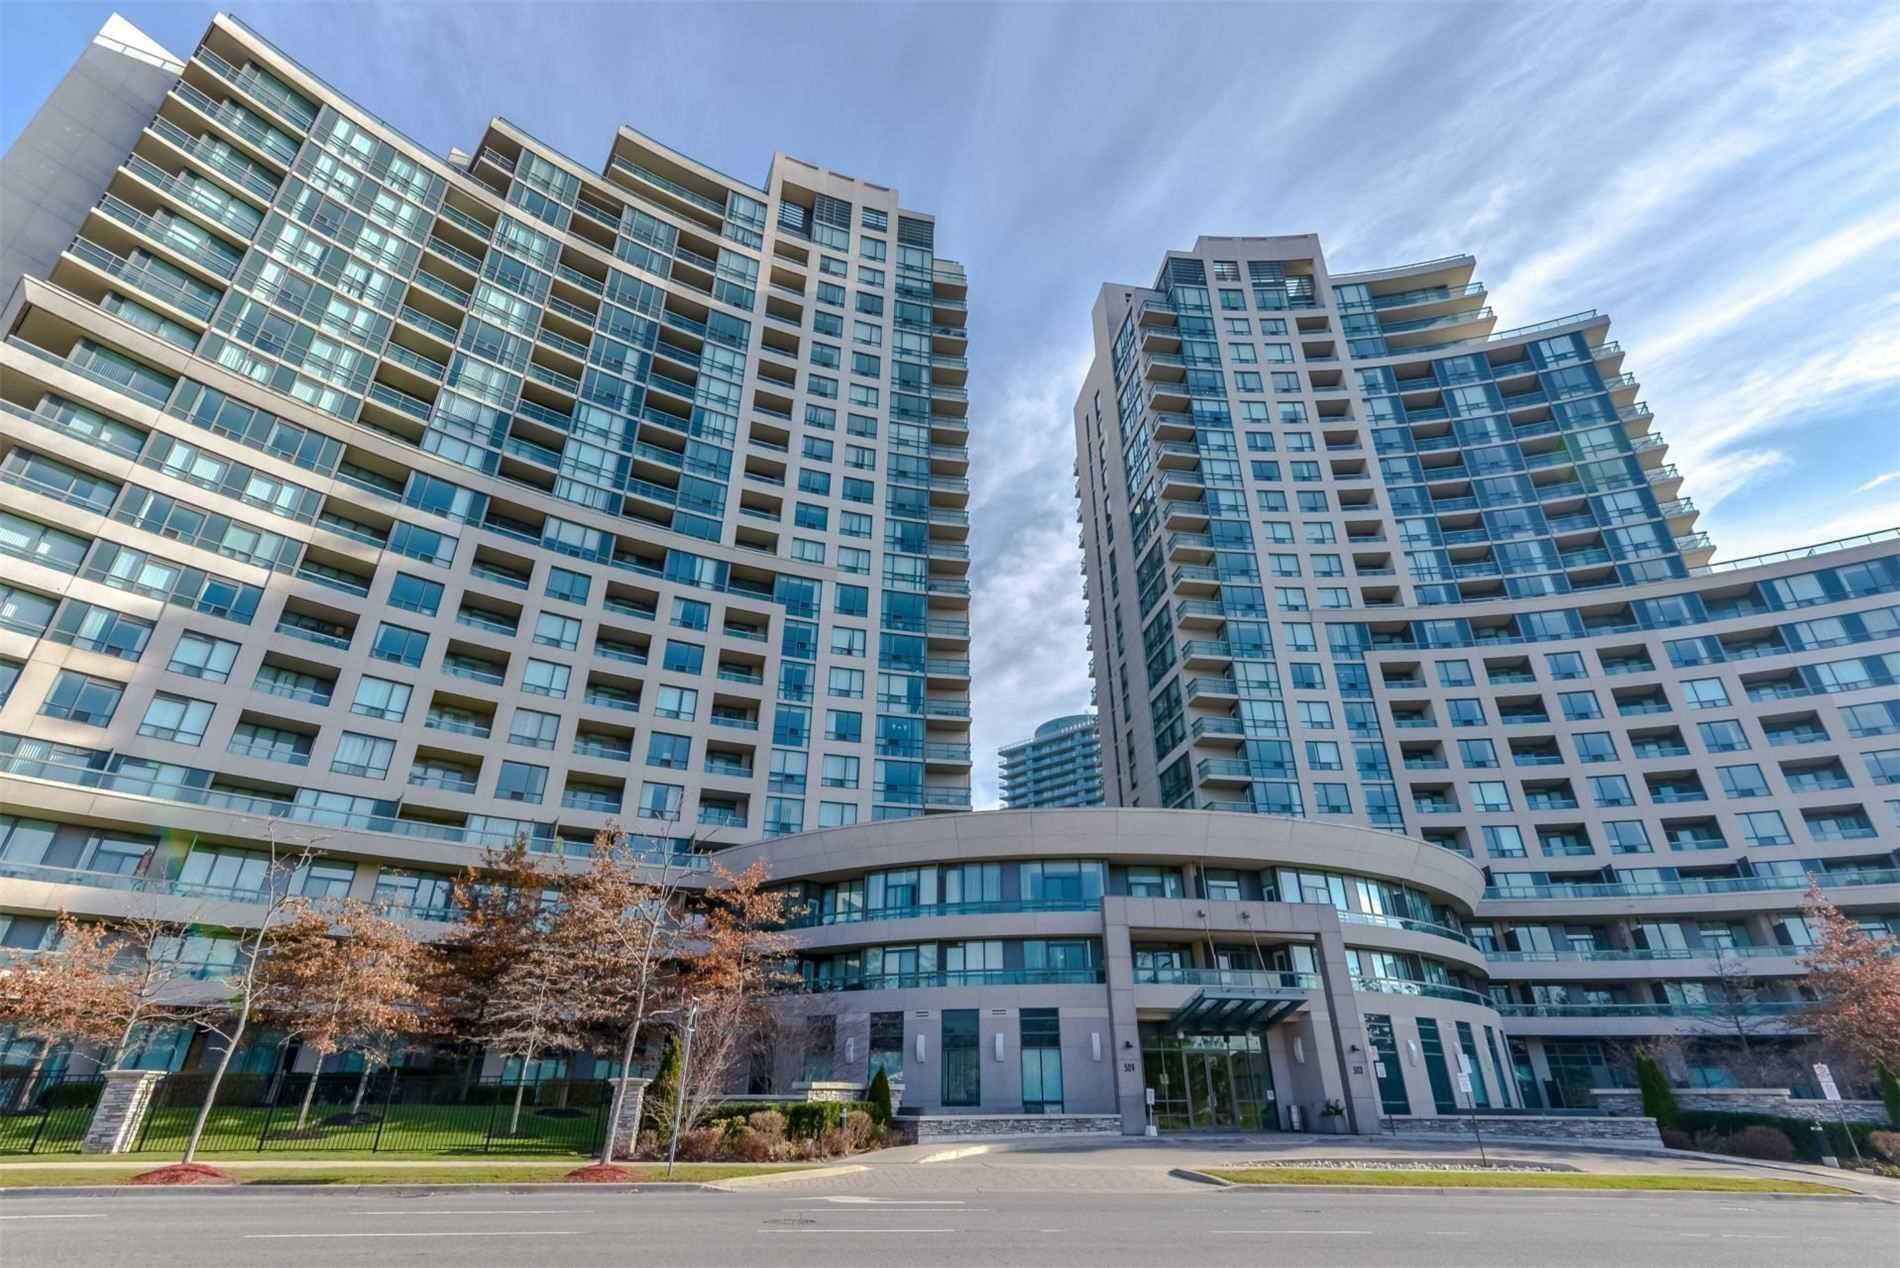 Main Photo: 205 509 Beecroft Road in Toronto: Willowdale West Condo for sale (Toronto C07)  : MLS®# C5310708